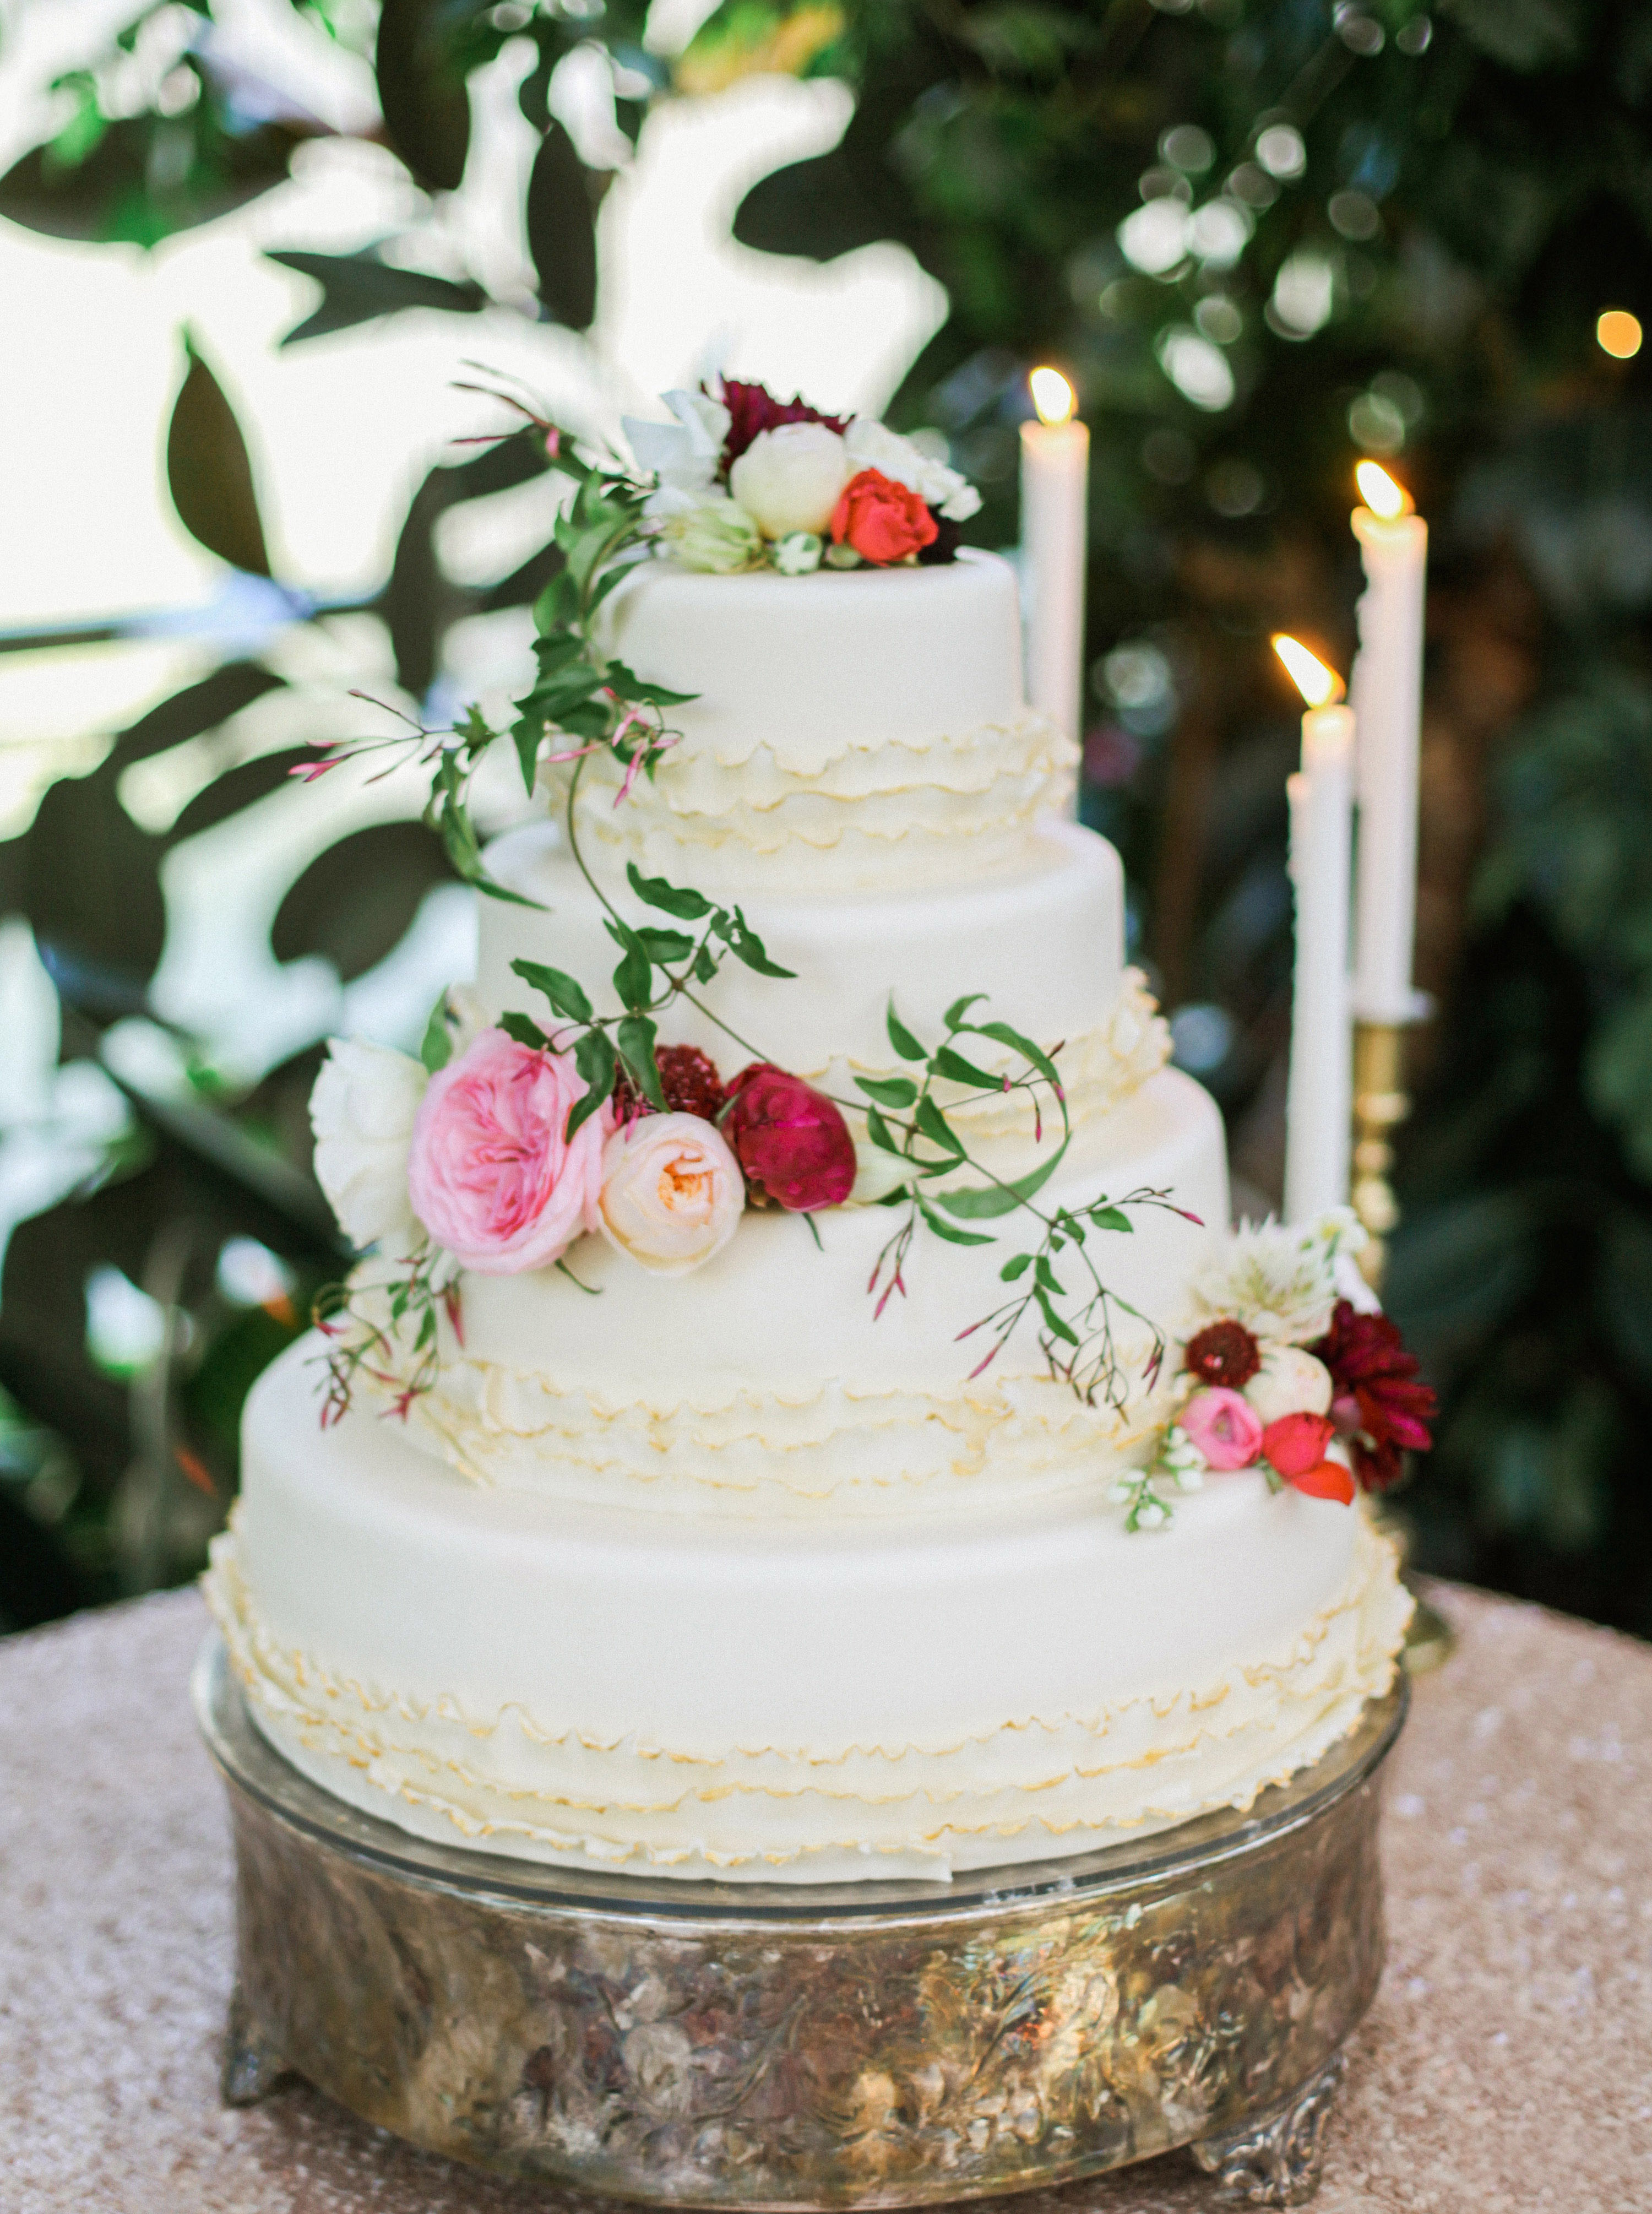 Wedding Cake With Floral Garland Elizabeth Anne Designs